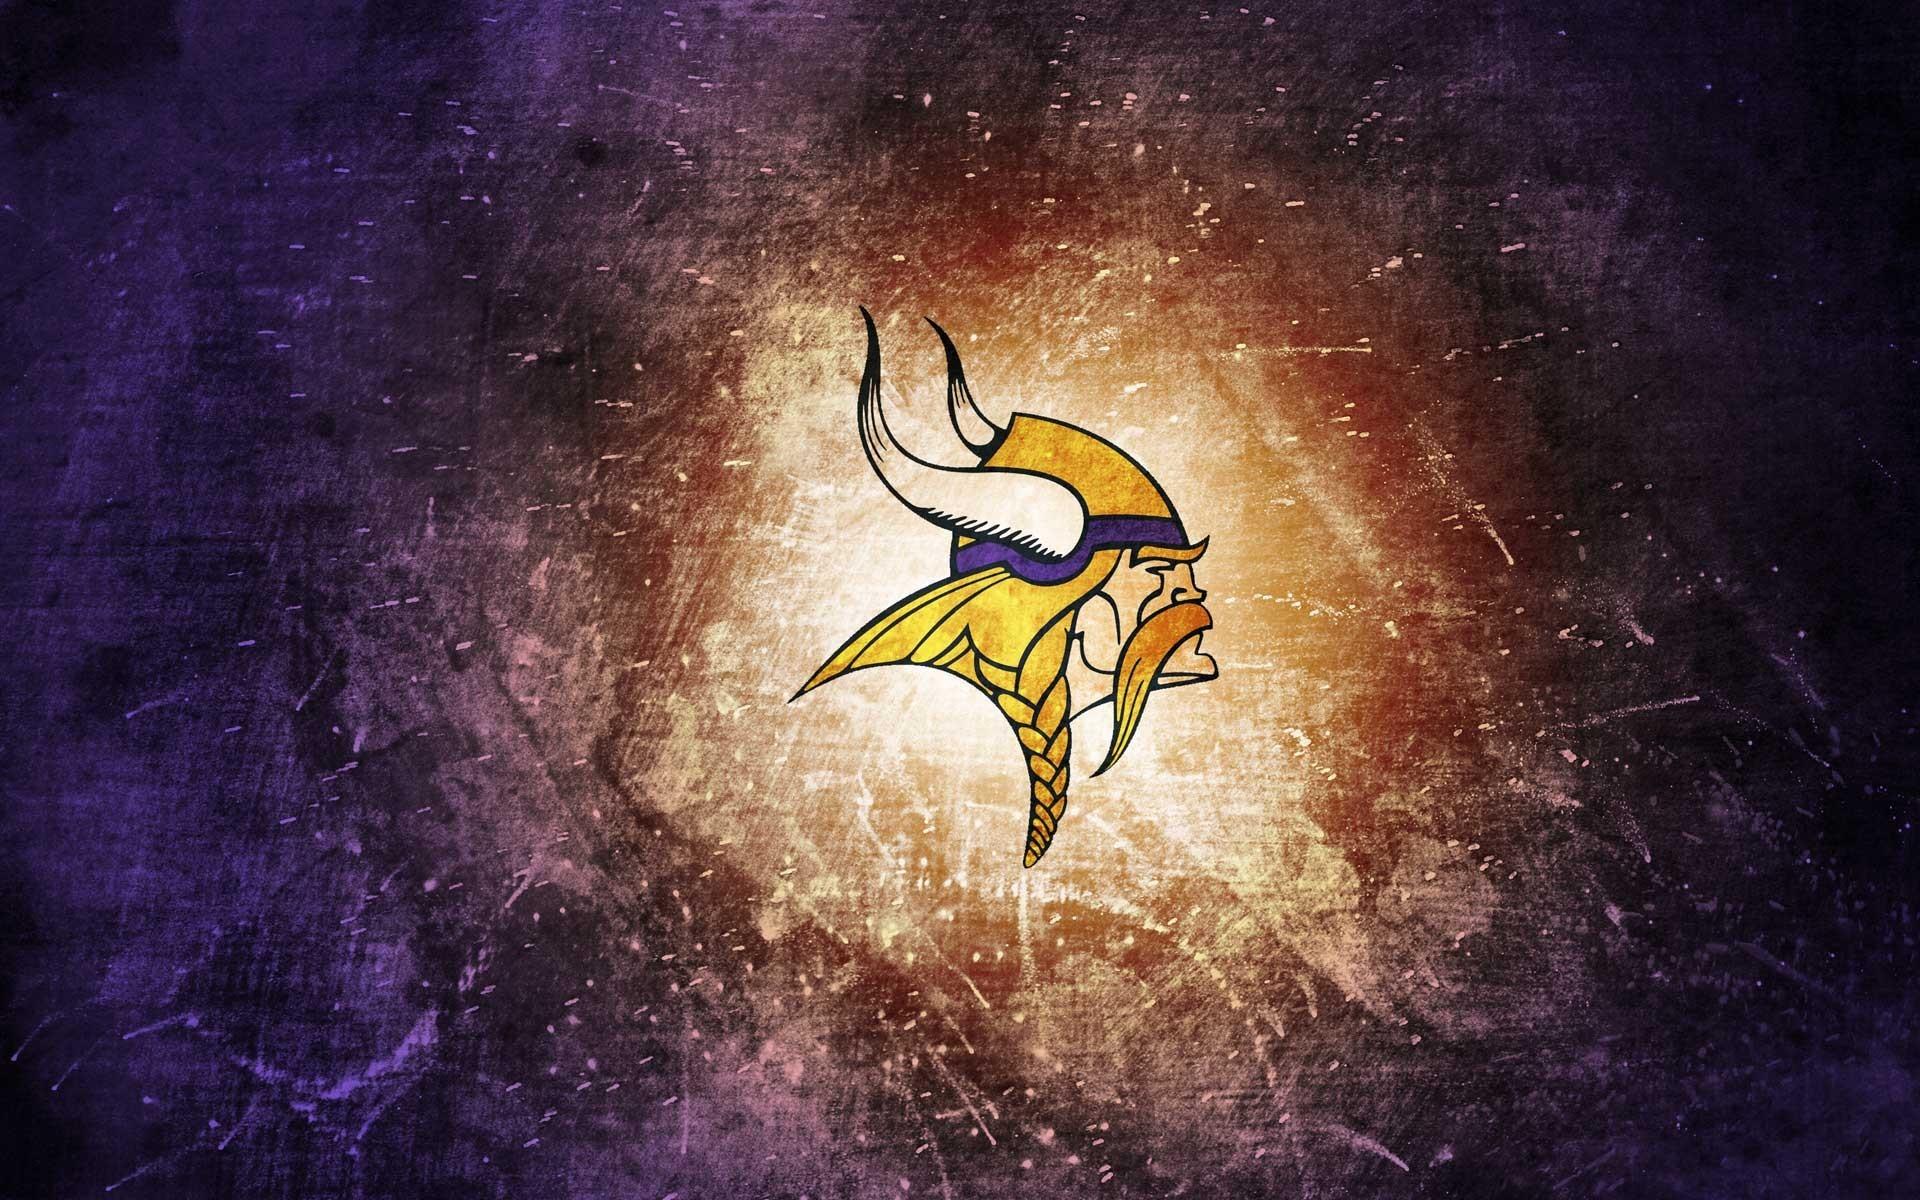 Vikings Screensaver